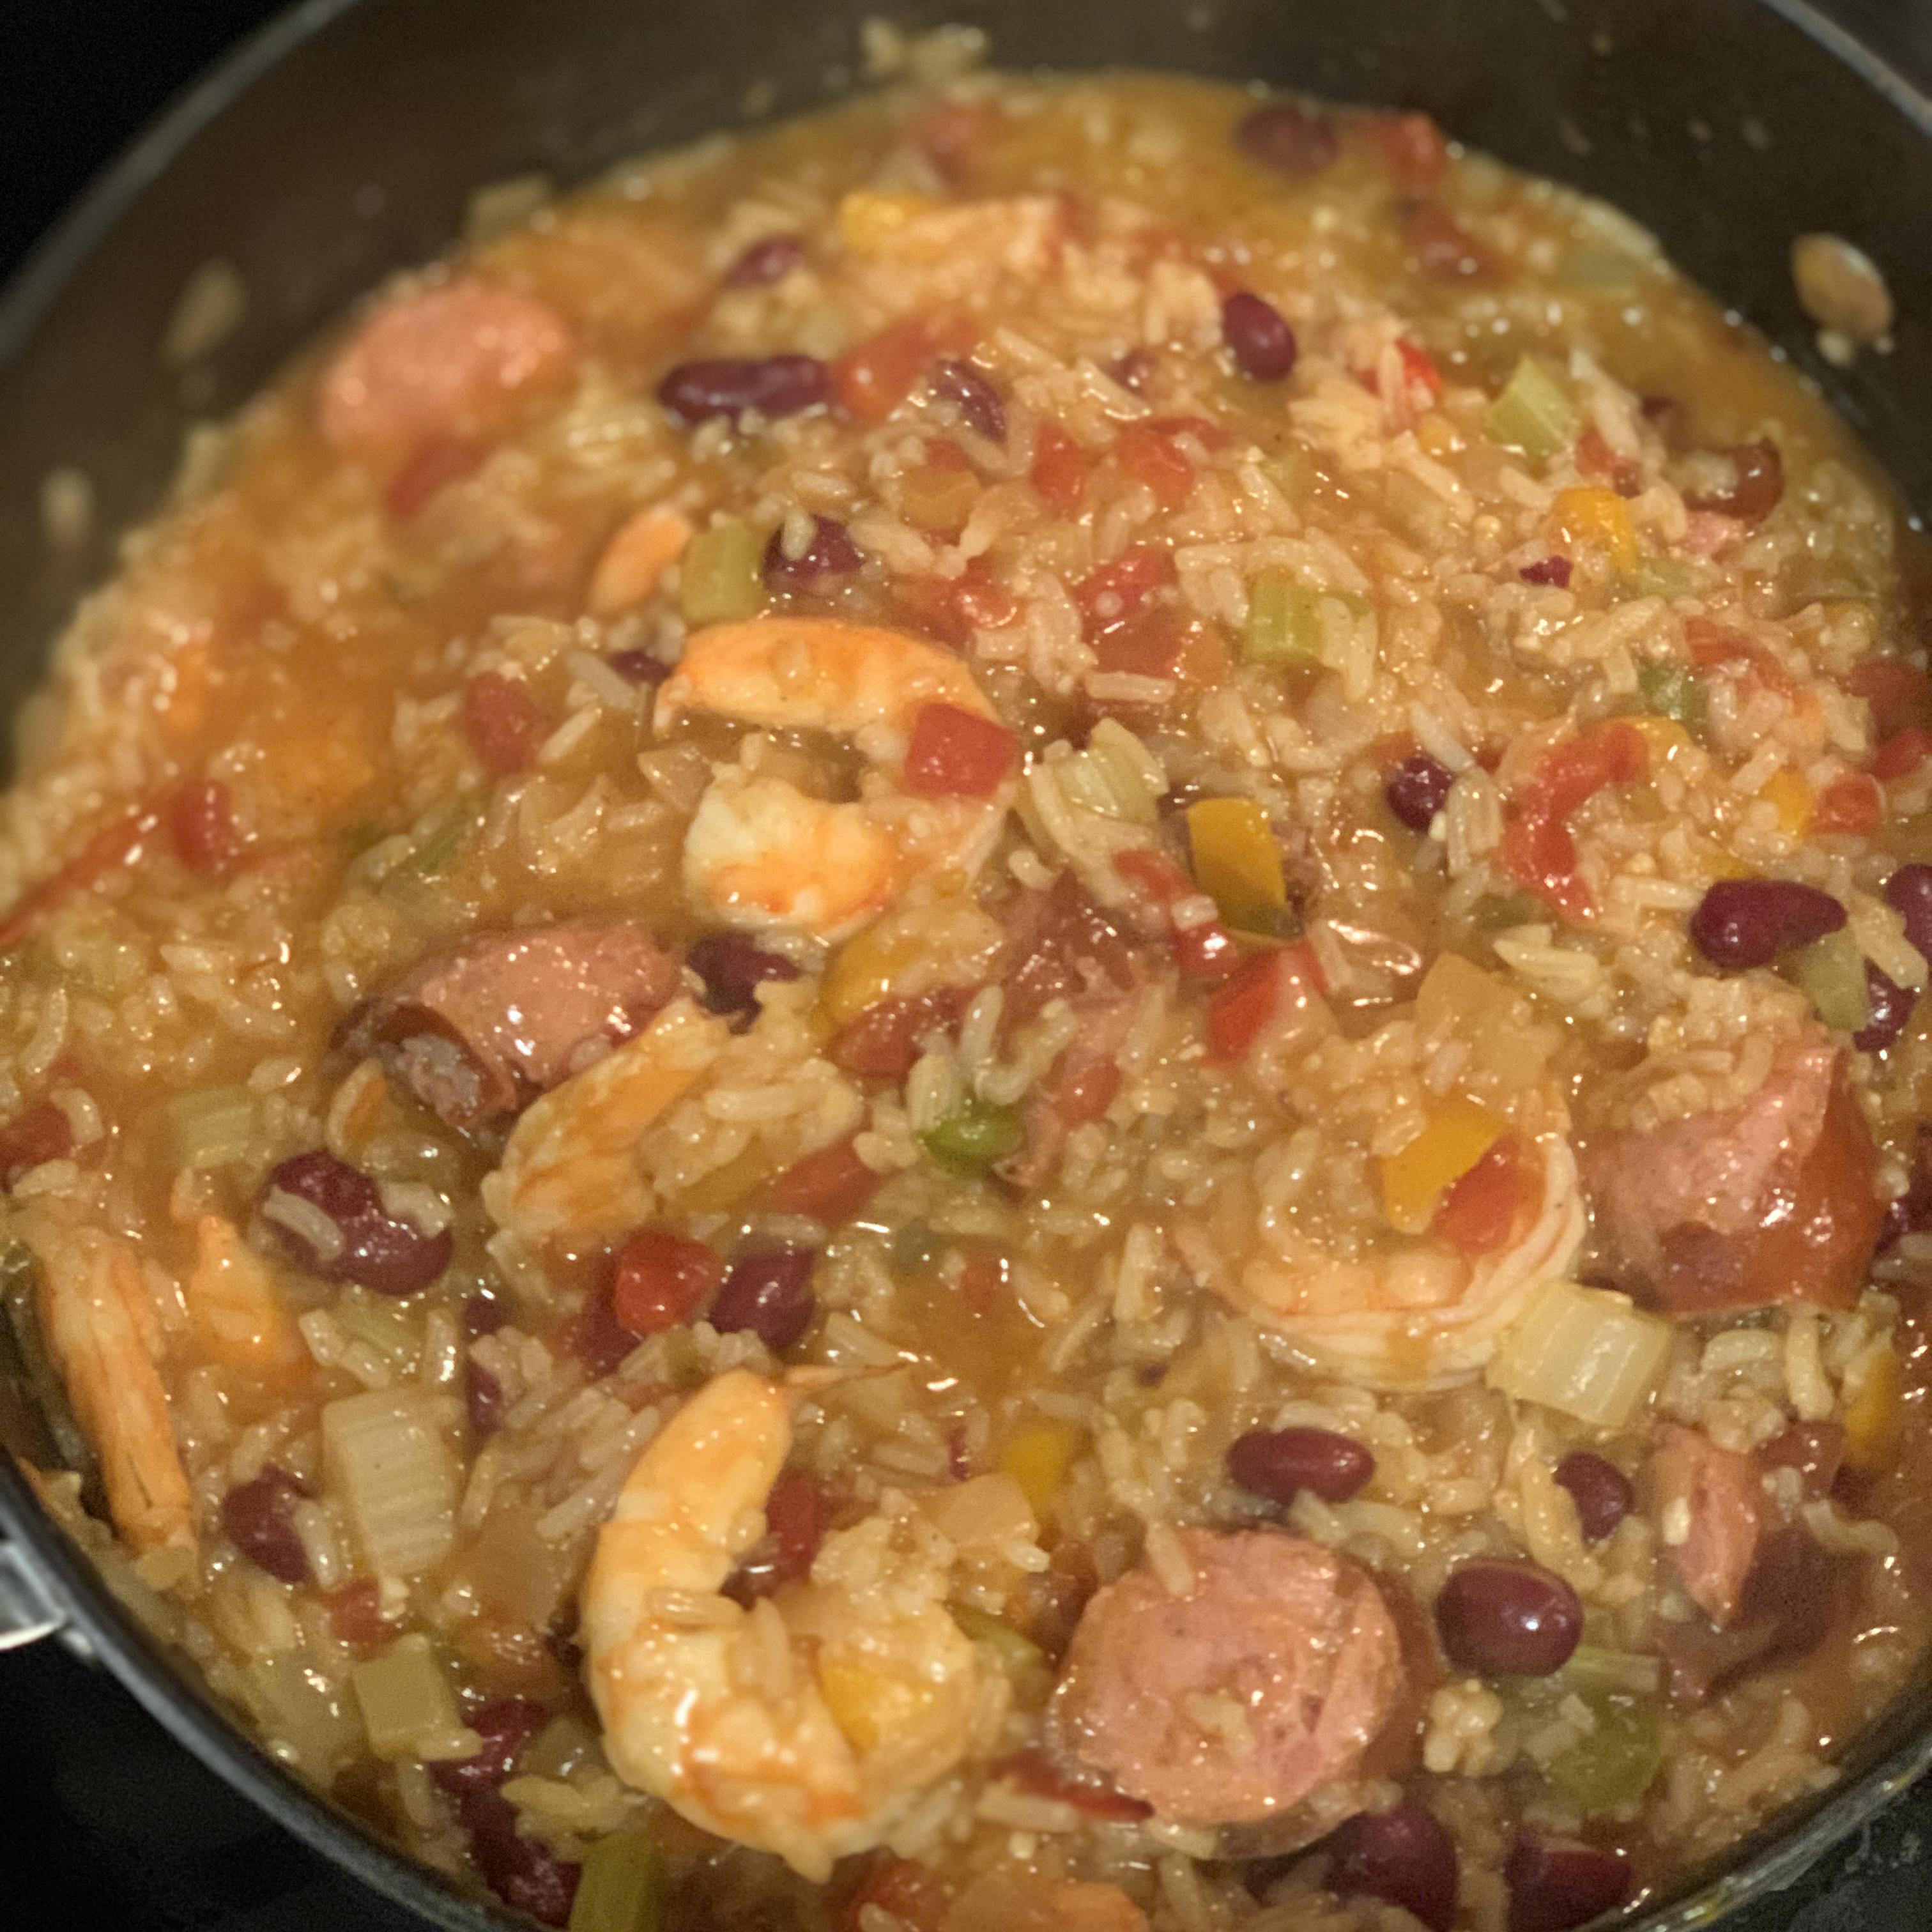 Shrimp and Smoked Sausage Jambalaya